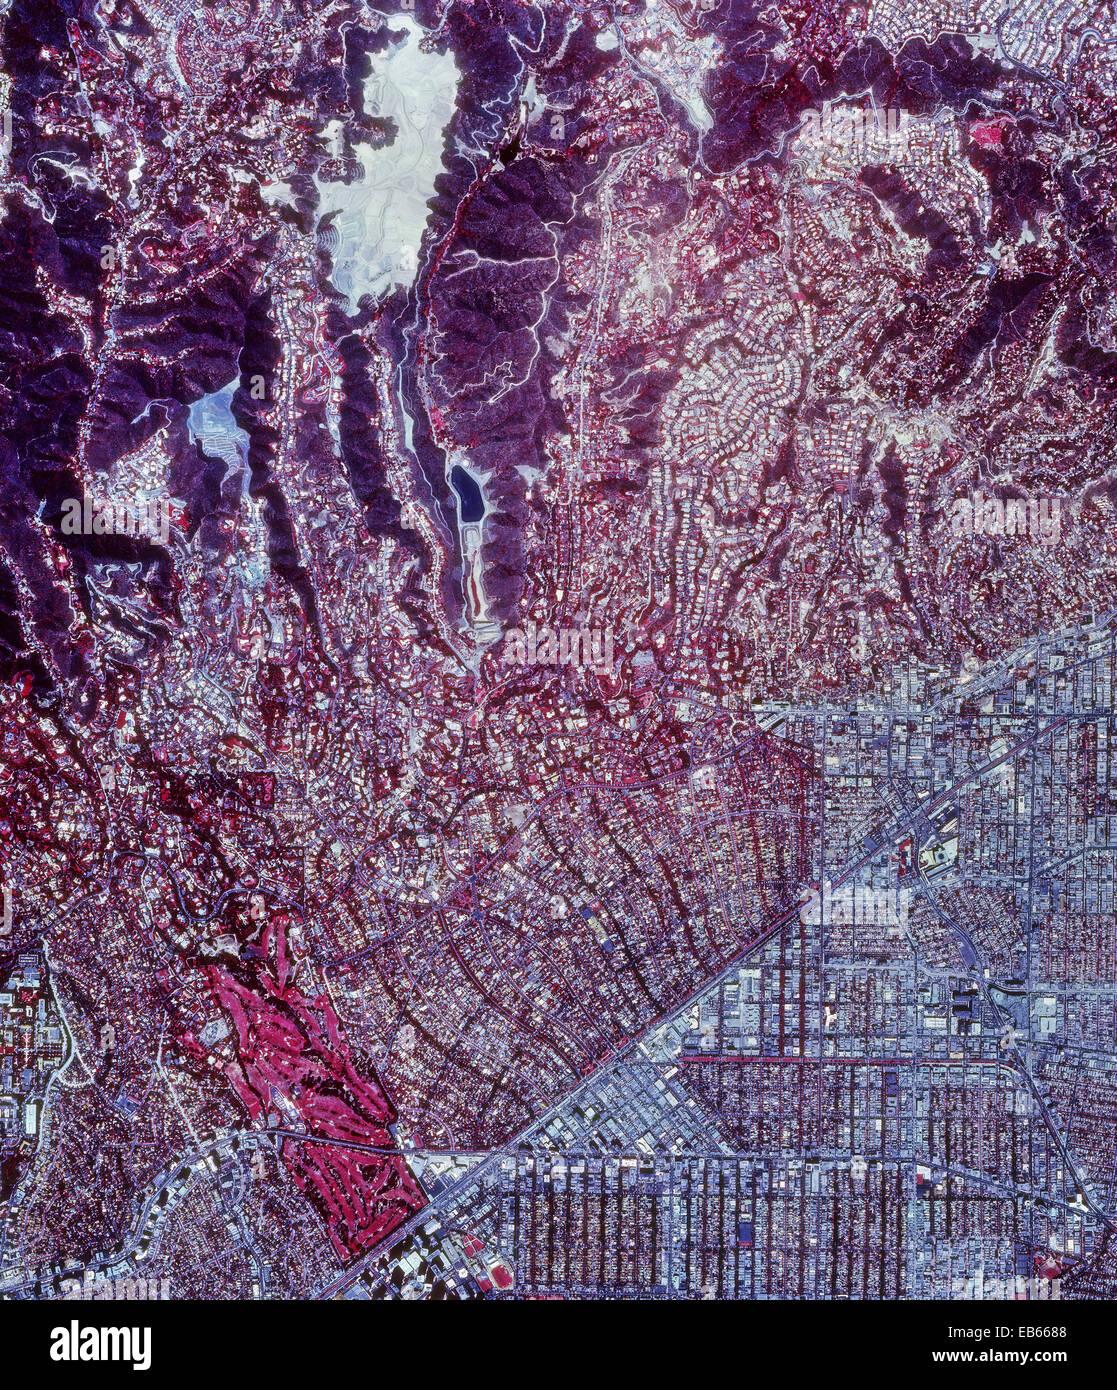 Histórica fotografía aérea infrarroja de Beverly Hills, California, 1989 Imagen De Stock